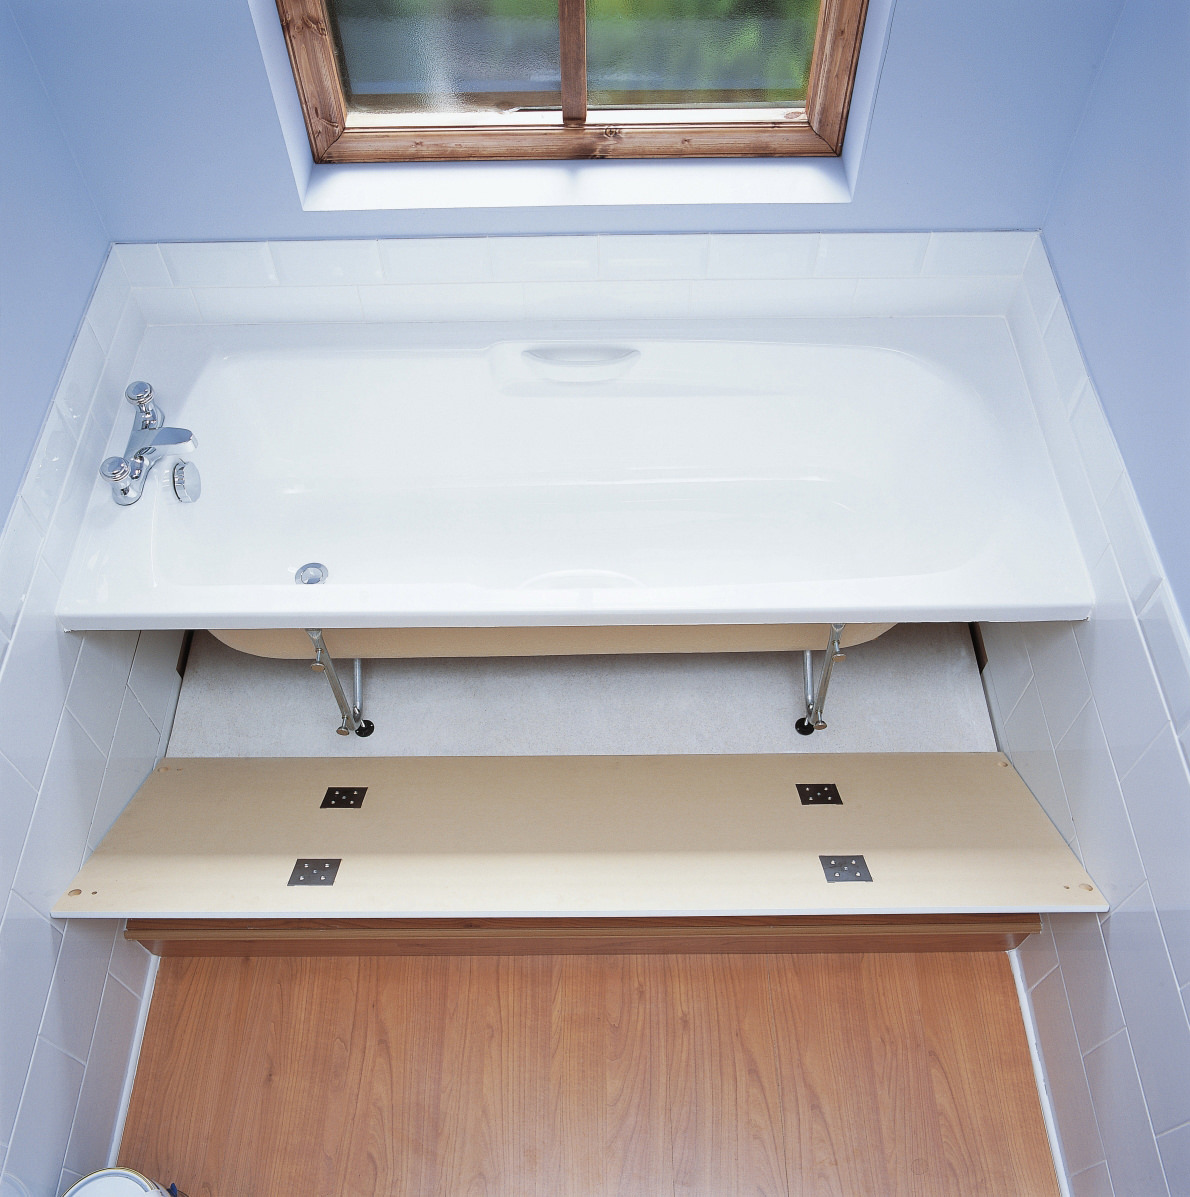 twyford refresh total install white front bath panel 1700mm. Black Bedroom Furniture Sets. Home Design Ideas